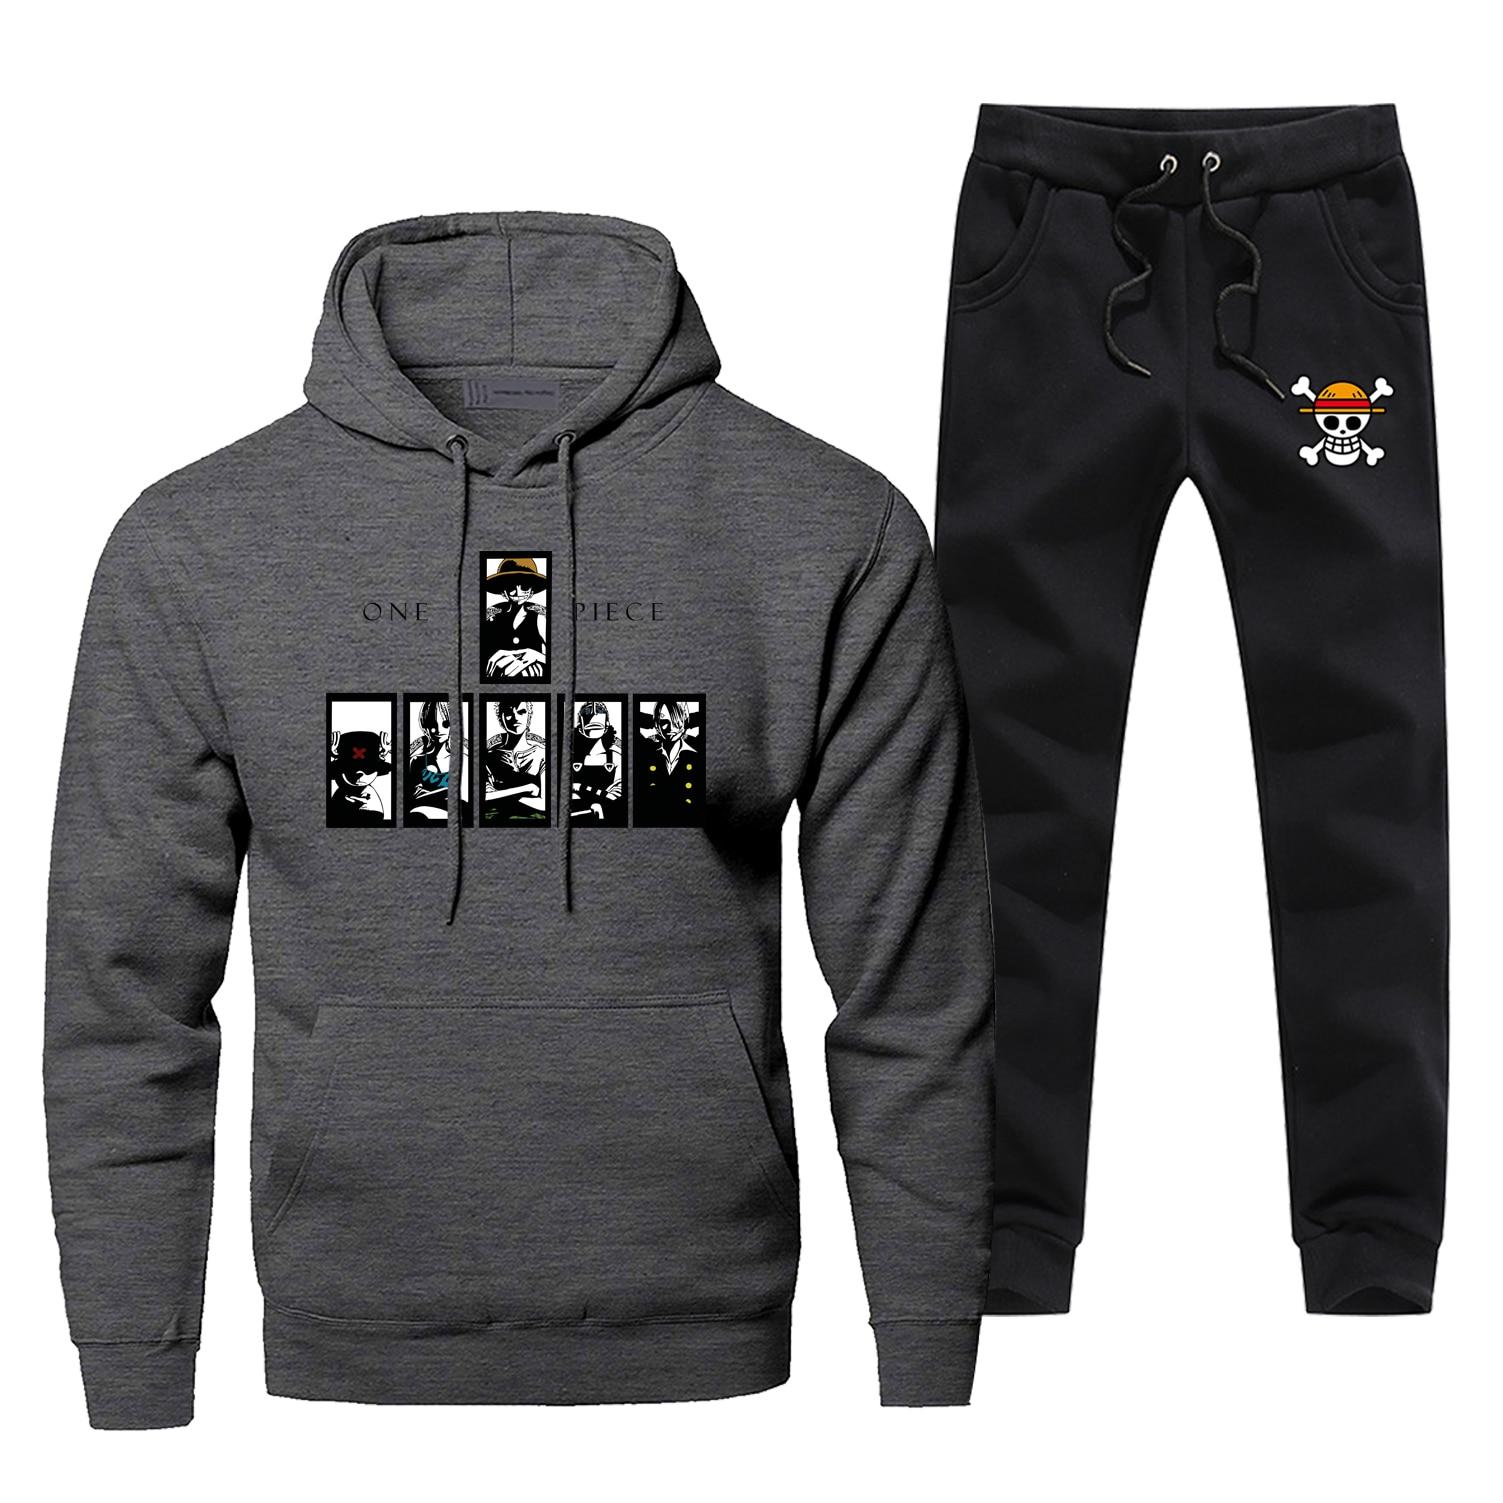 Monkey D Luffy Print Men's Full Suit Tracksuit Casual Fashion One Piece Pants Sweatshirt Harajuku Set Fleece Japan Anime Hoodies